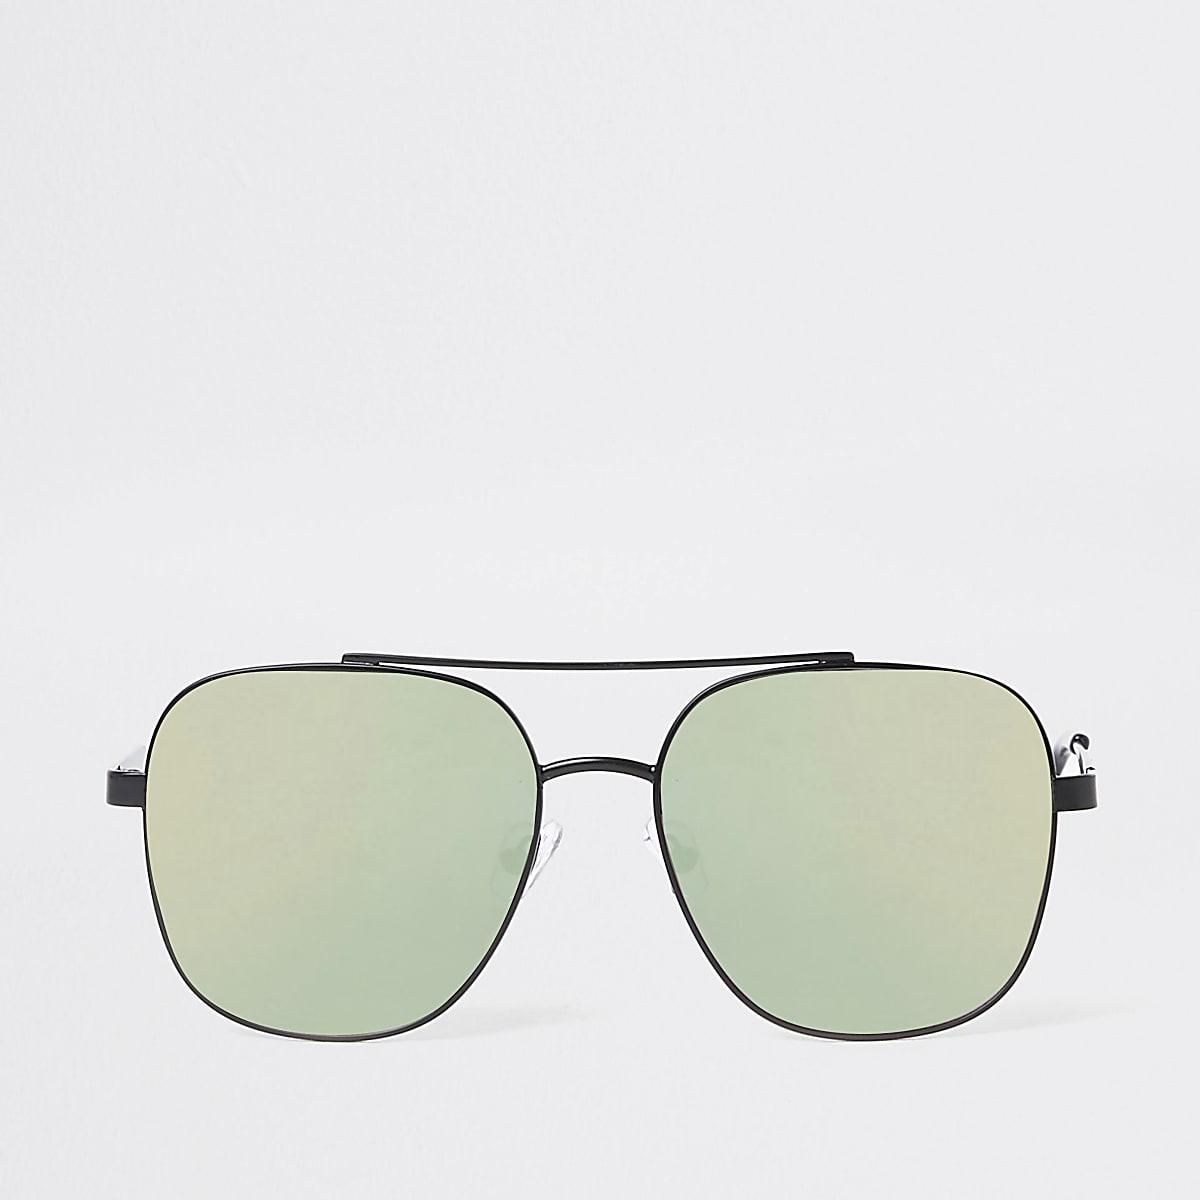 Black mirror lens aviator sunglasses